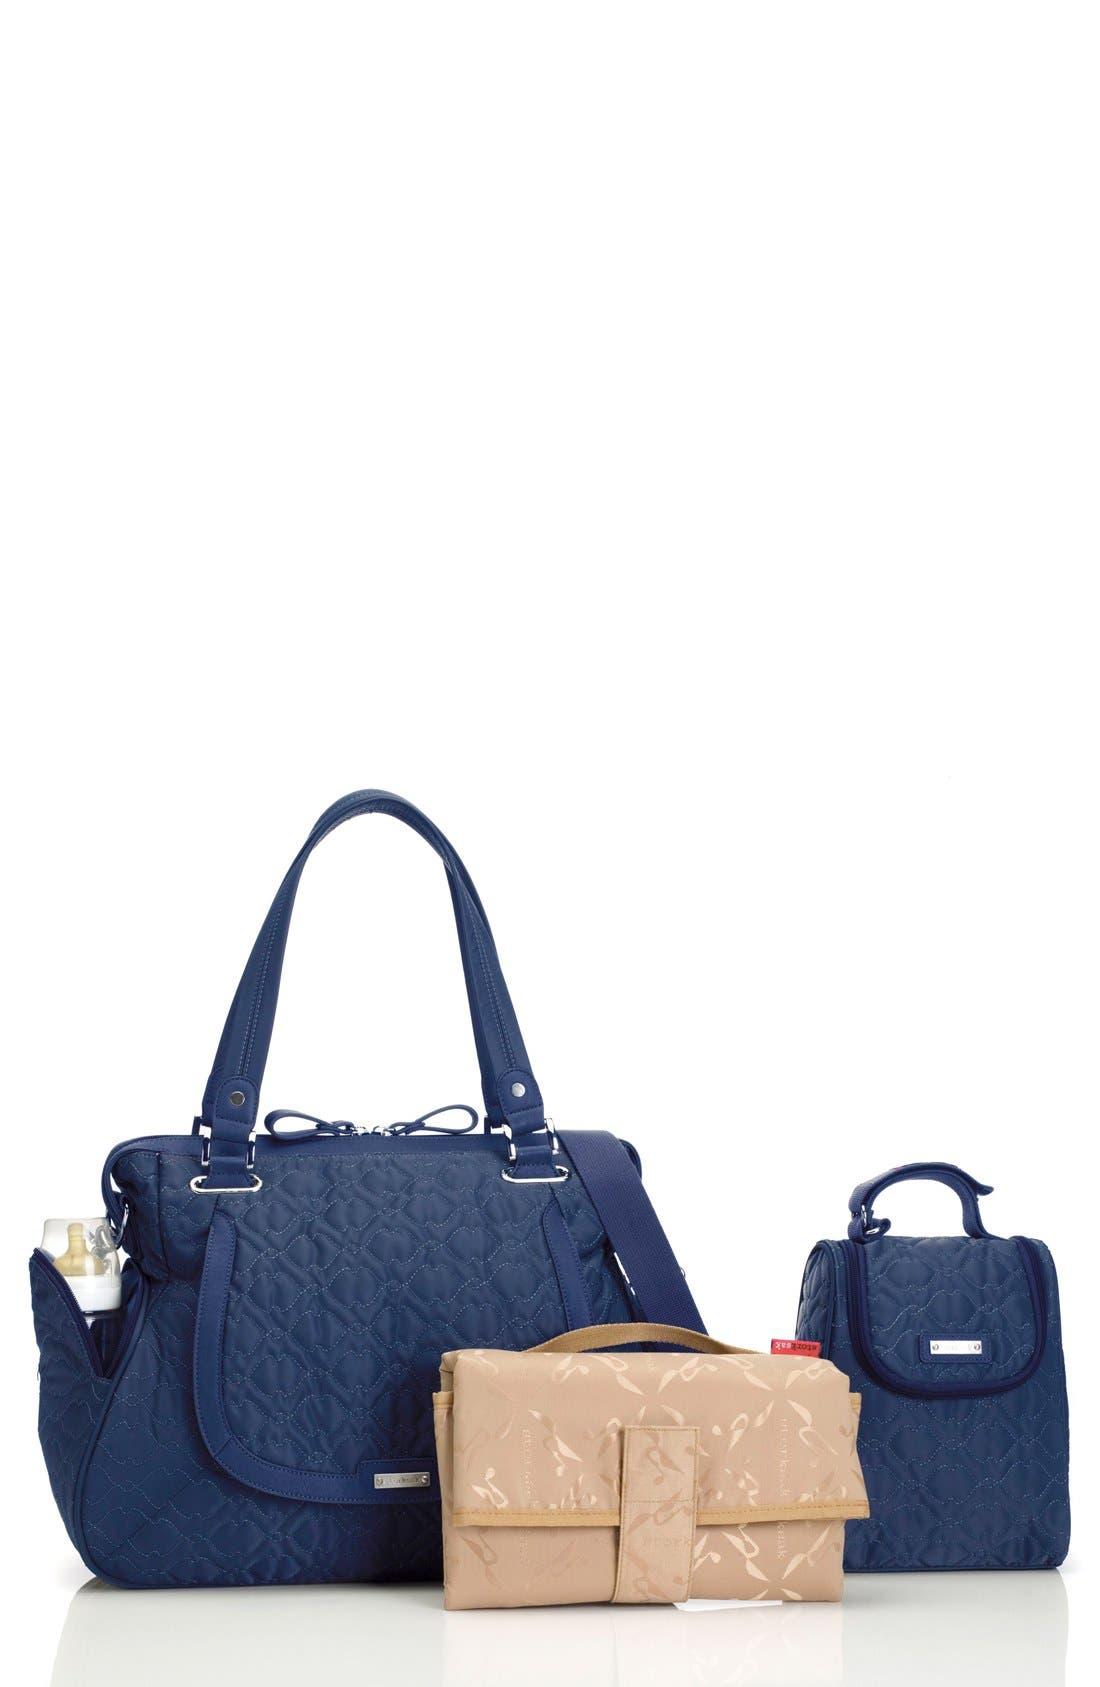 'Anna' Diaper Bag,                             Main thumbnail 1, color,                             Navy